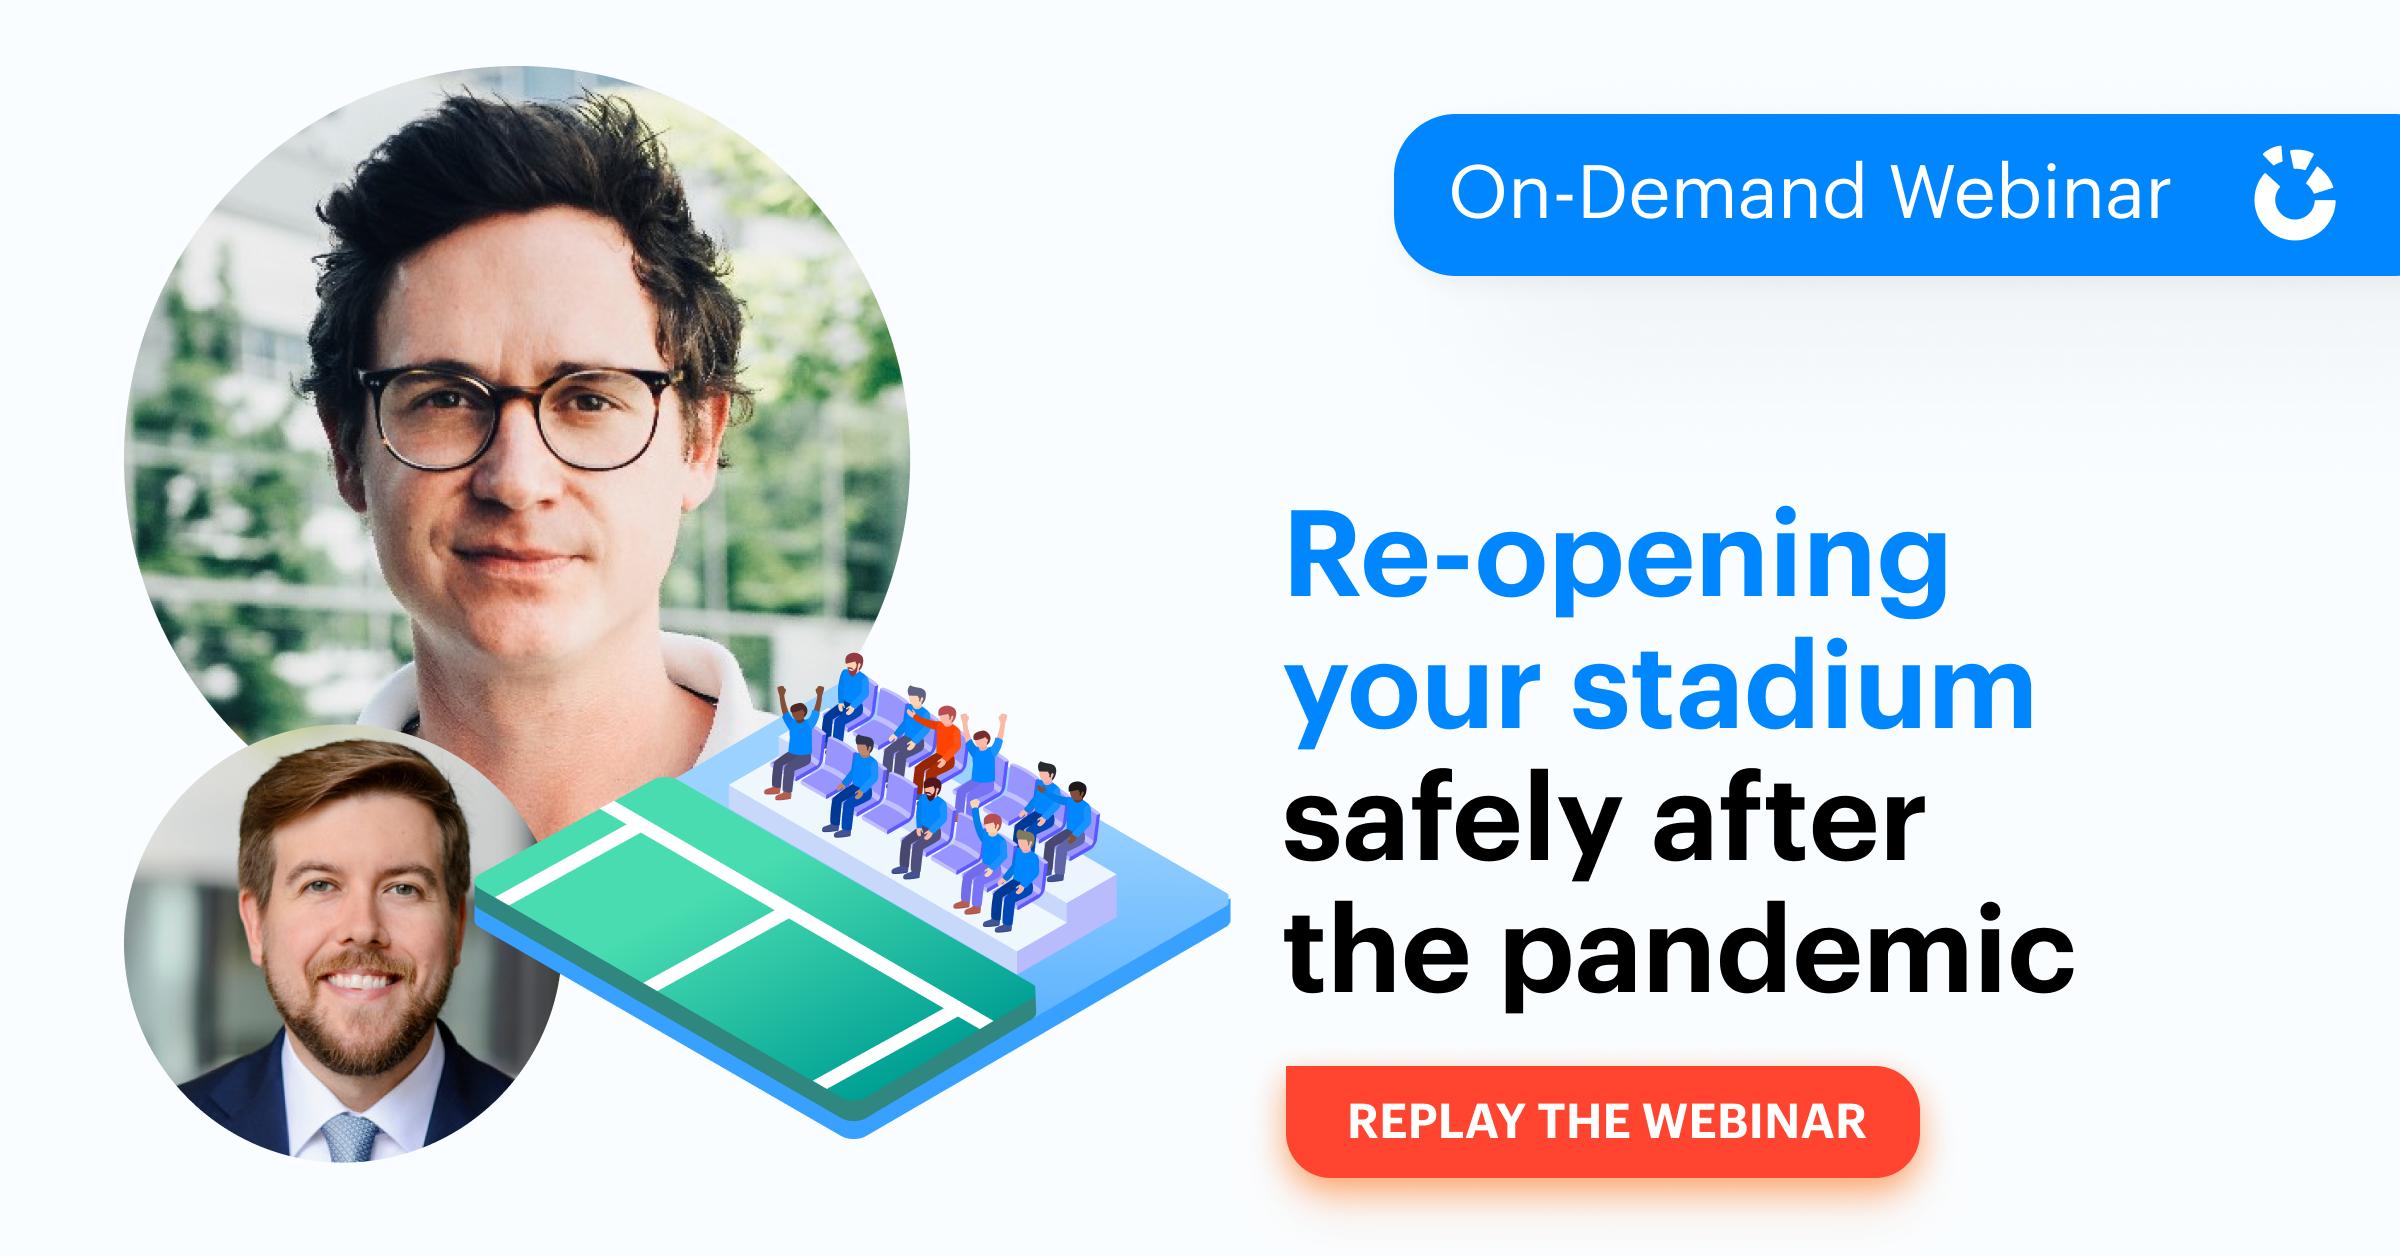 Stadium Webinar - On-Demand